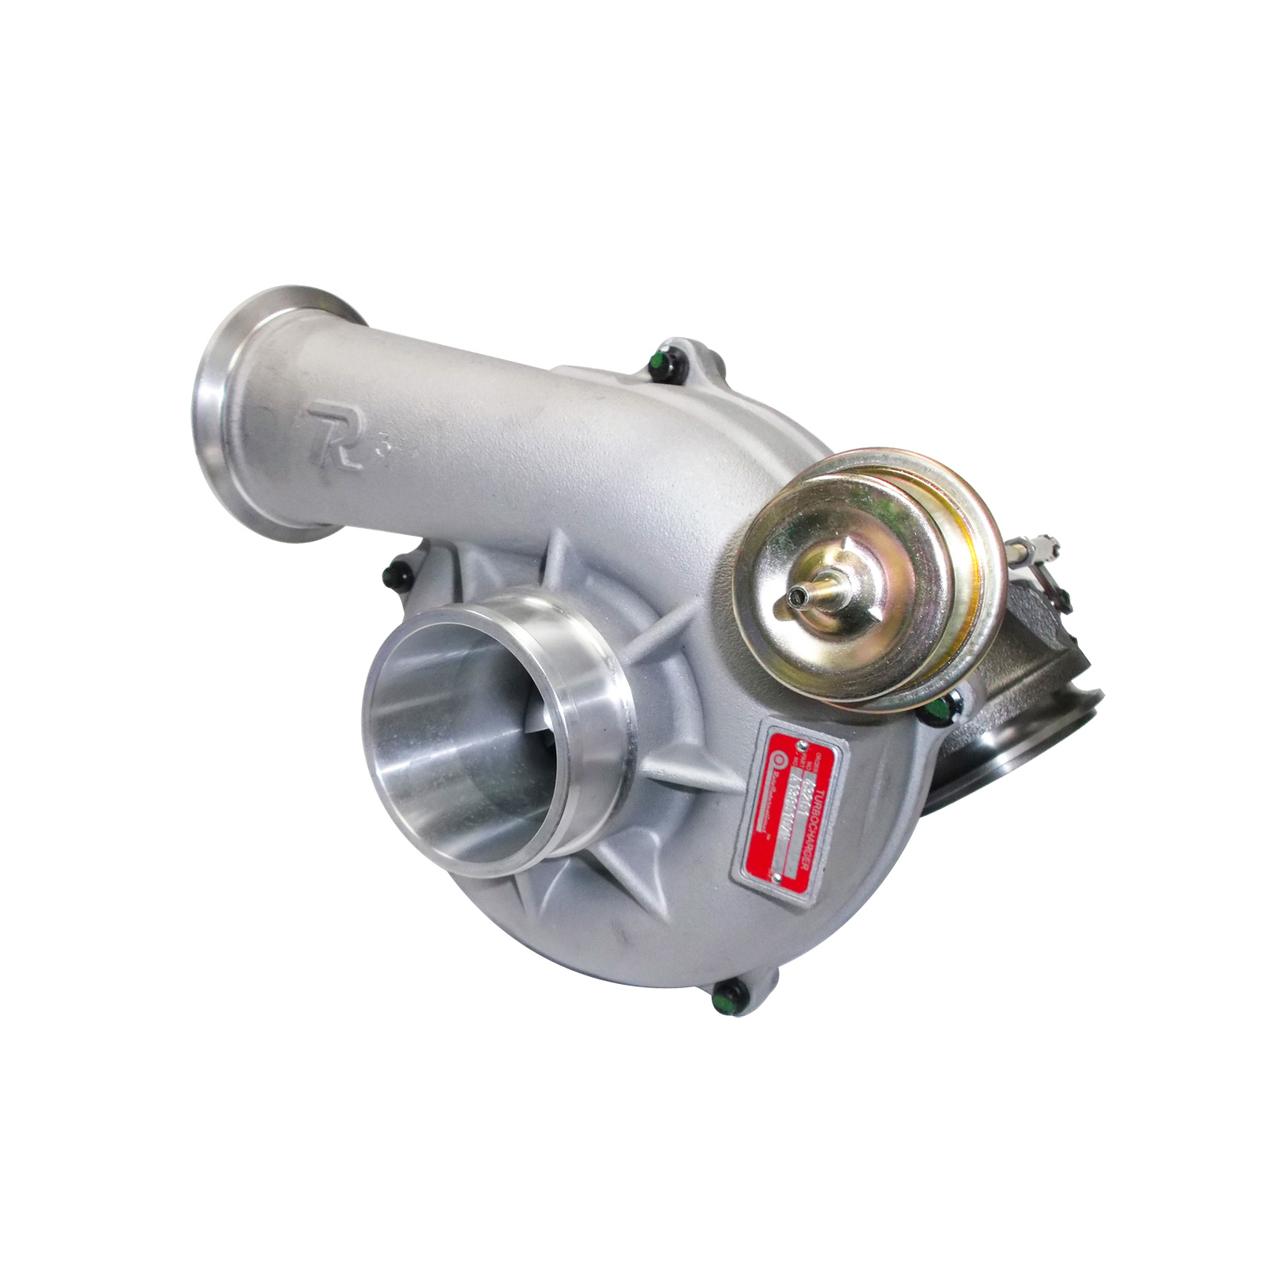 Best Fuel Injectors For 7 3 Liter Powerstroke Engines Fordiesels Blog